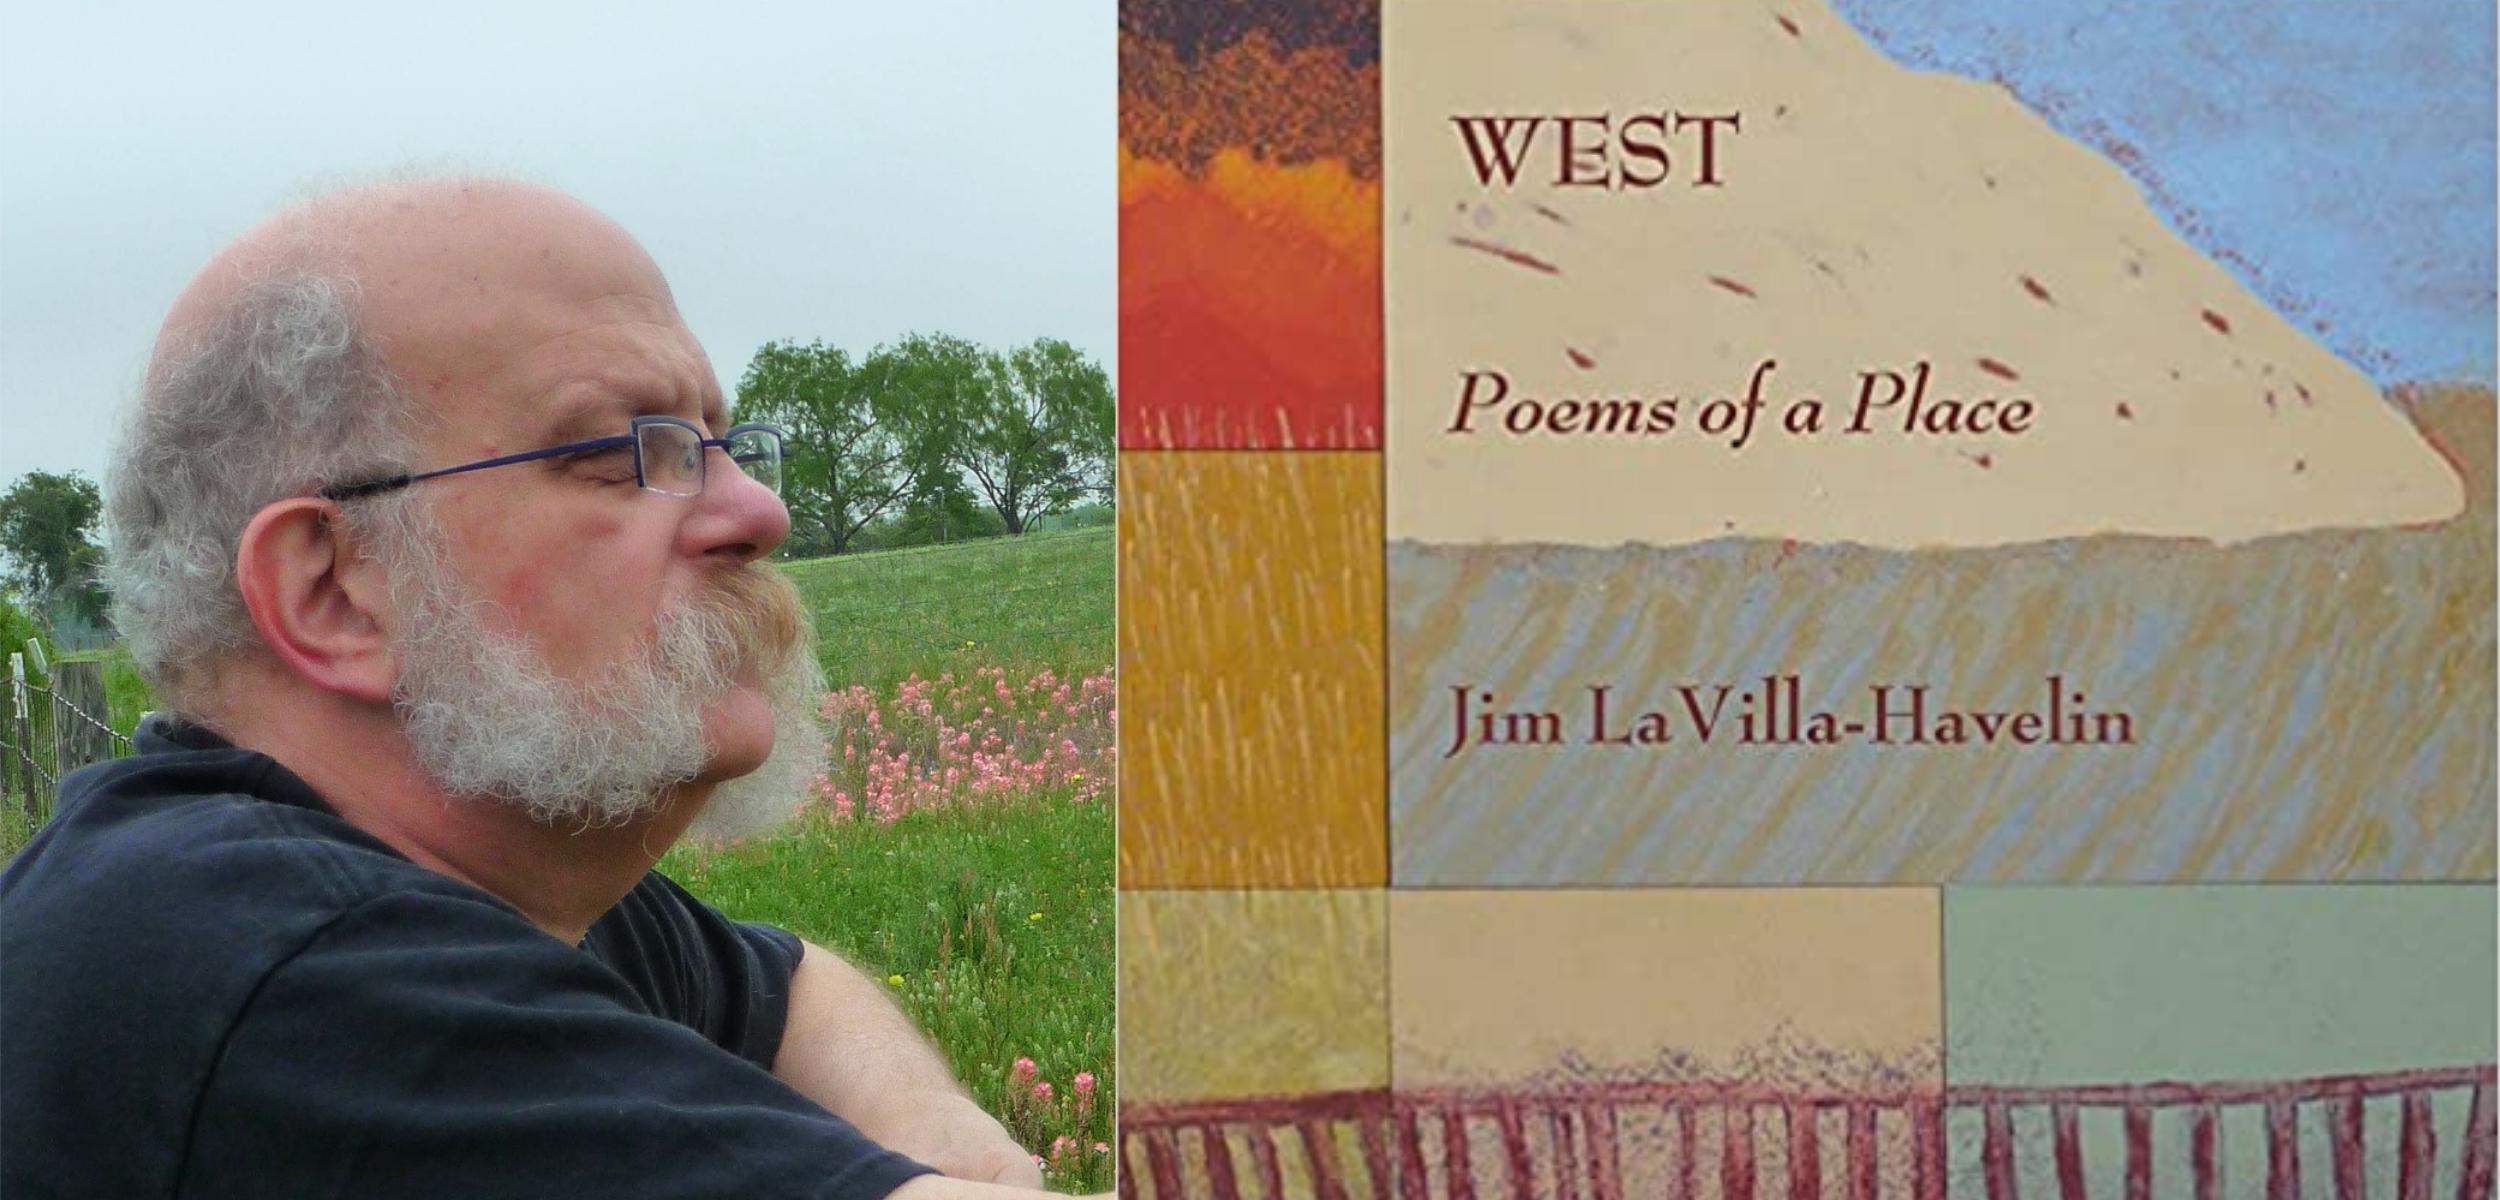 An Interview with Teaching Artist Jim LaVilla-Havelin